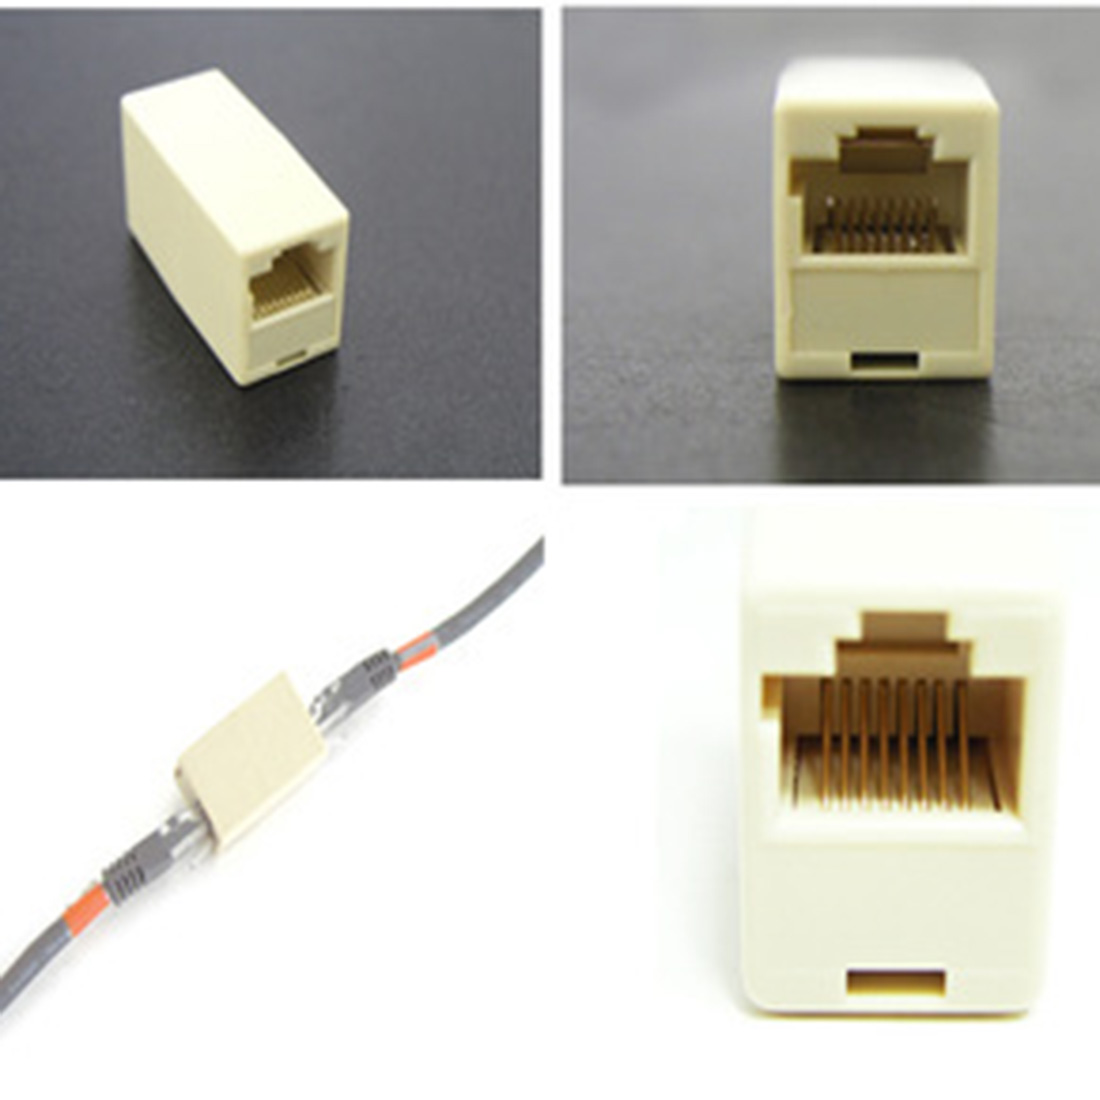 Marsnaska Universal Cable Joiner RJ45 Adapter Connector Network Ethernet LAN Coupler For Extension Broadband Extender Plug 1pc black female to female network lan connector adapter coupler extender rj45 ethernet cable join extension converter coupler